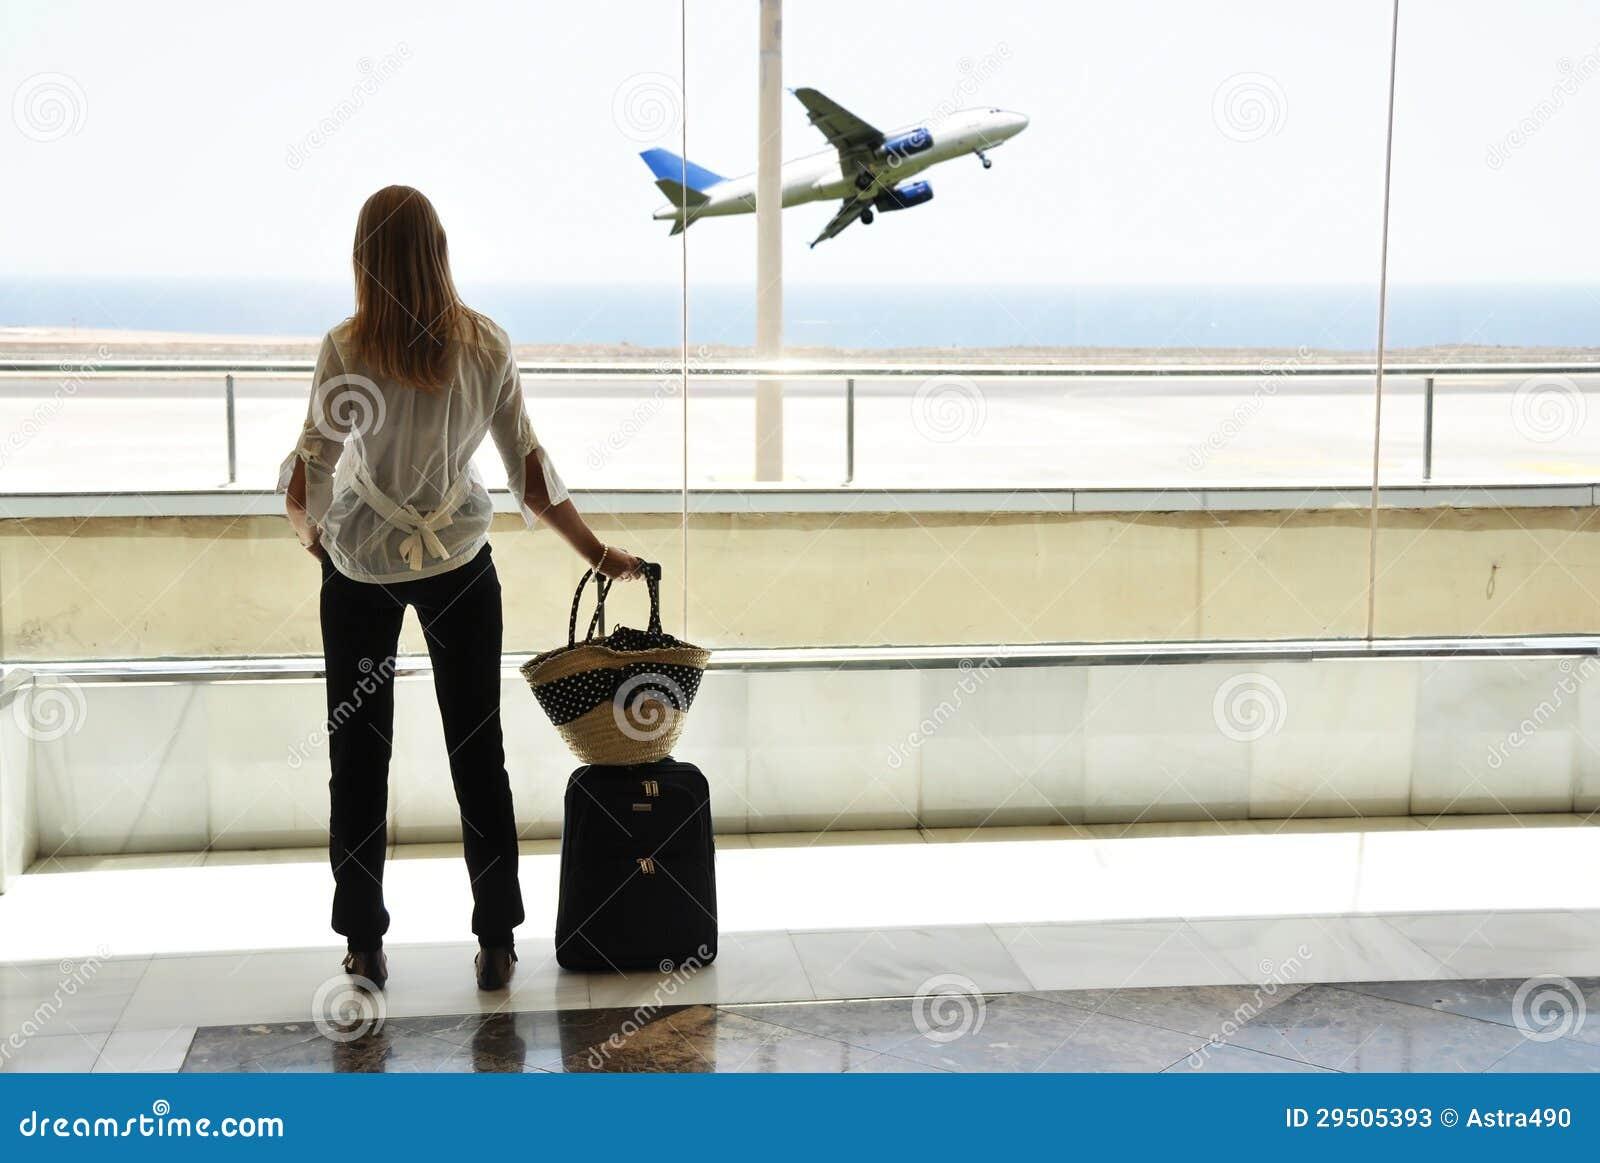 Фото девушки у самолета со спины